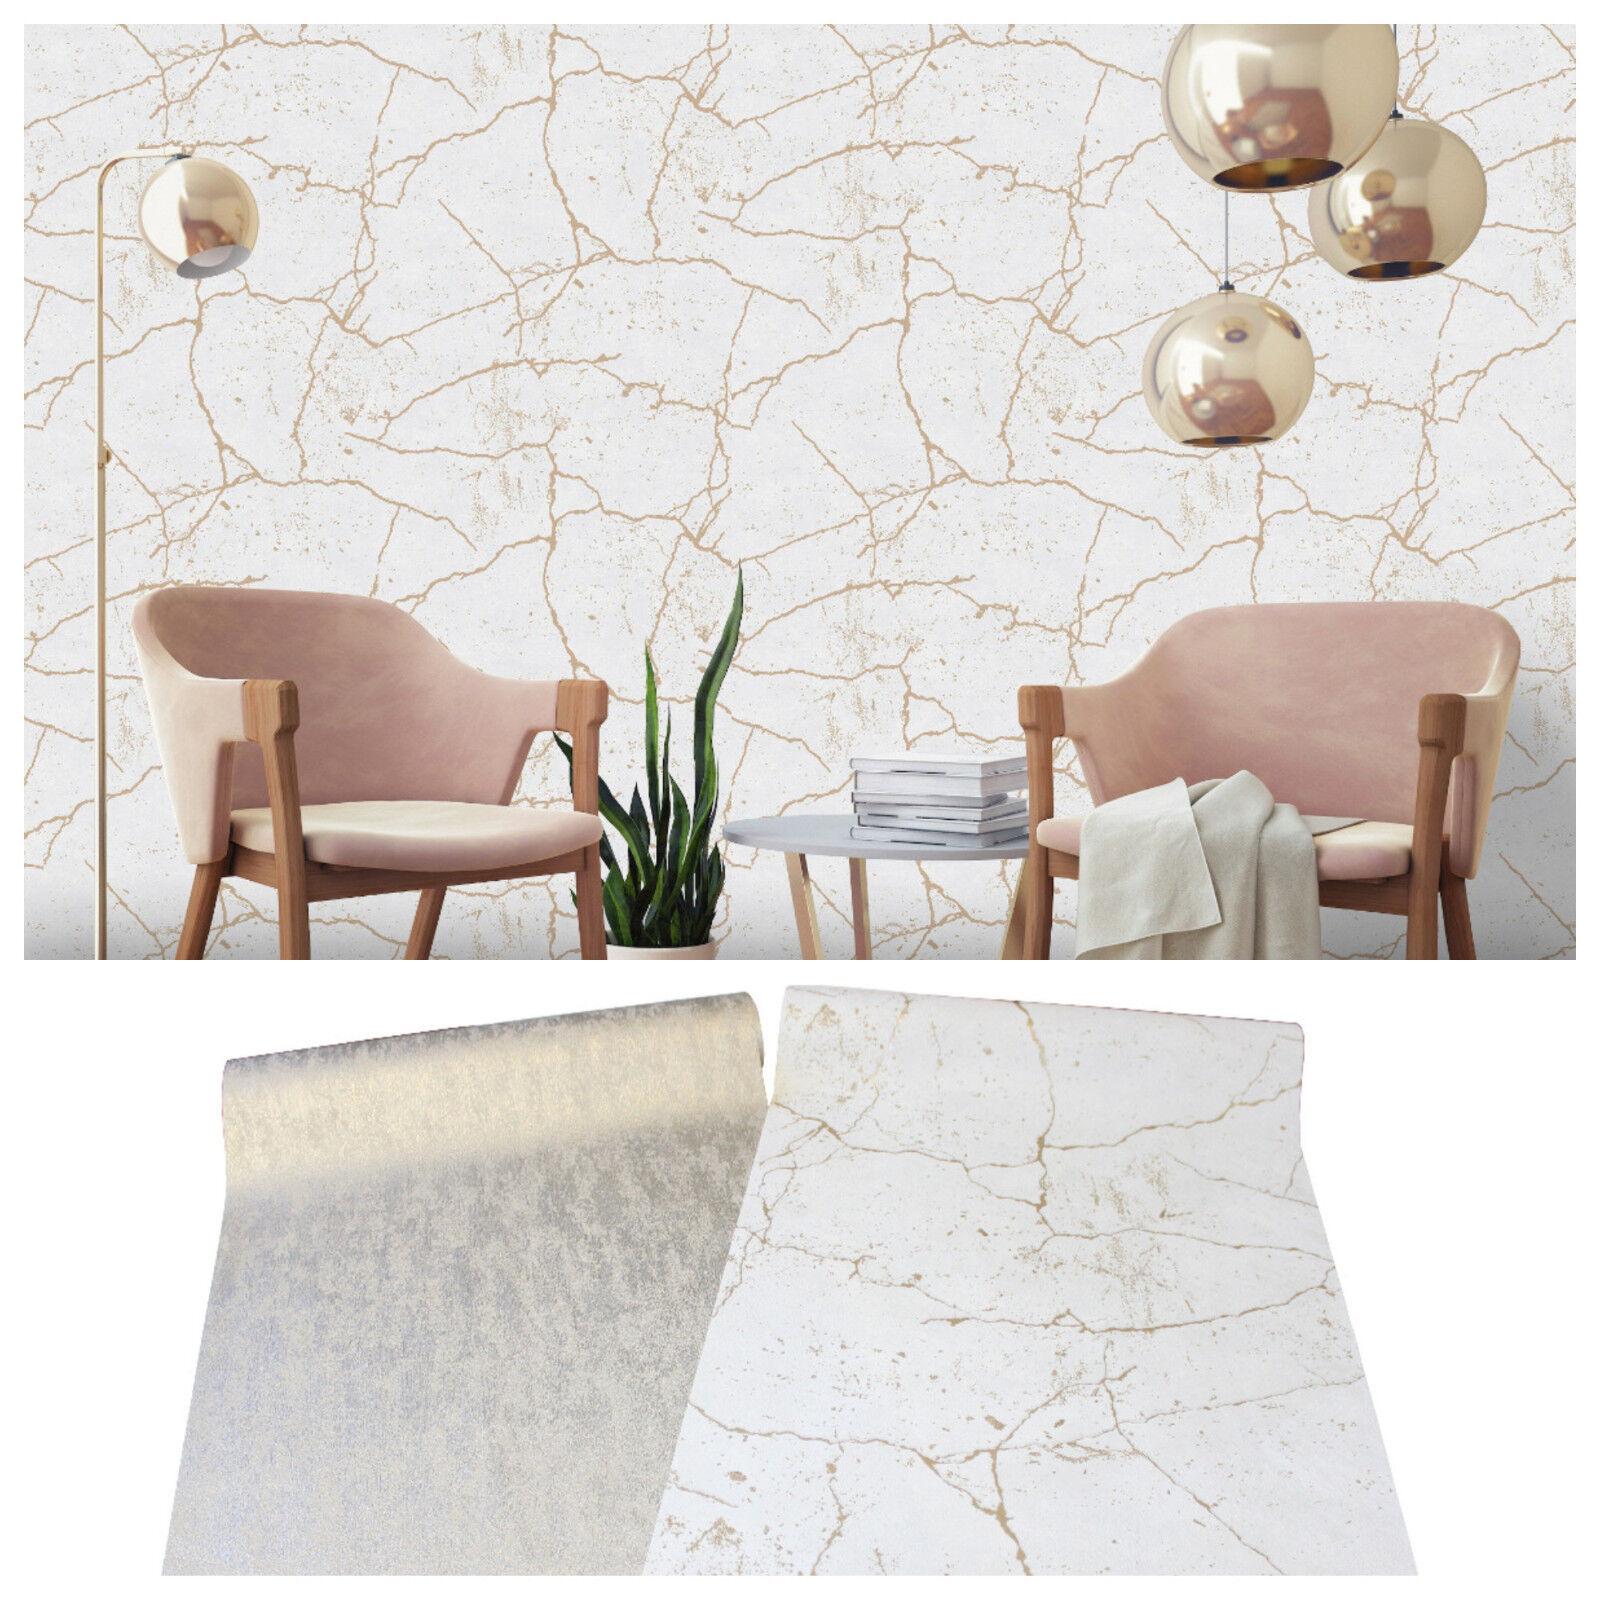 vlies tapete beton stein kintsugi optik creme beige uni. Black Bedroom Furniture Sets. Home Design Ideas